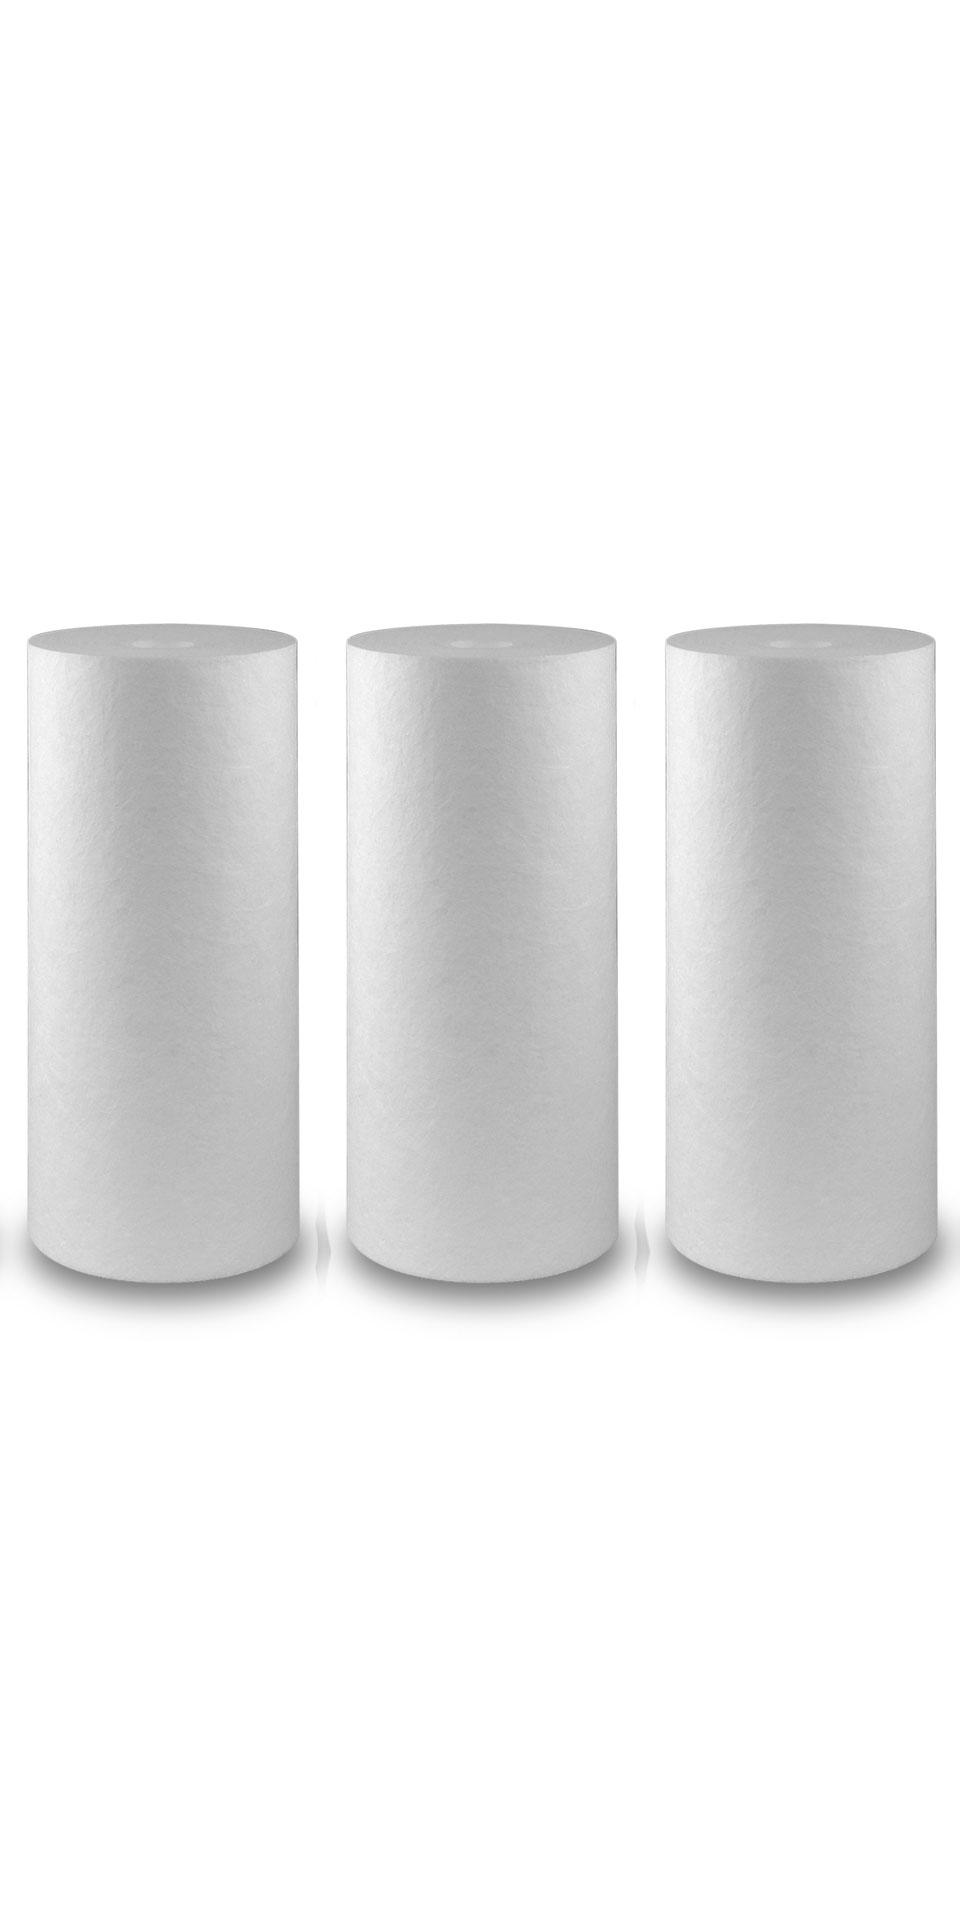 Filter Pack